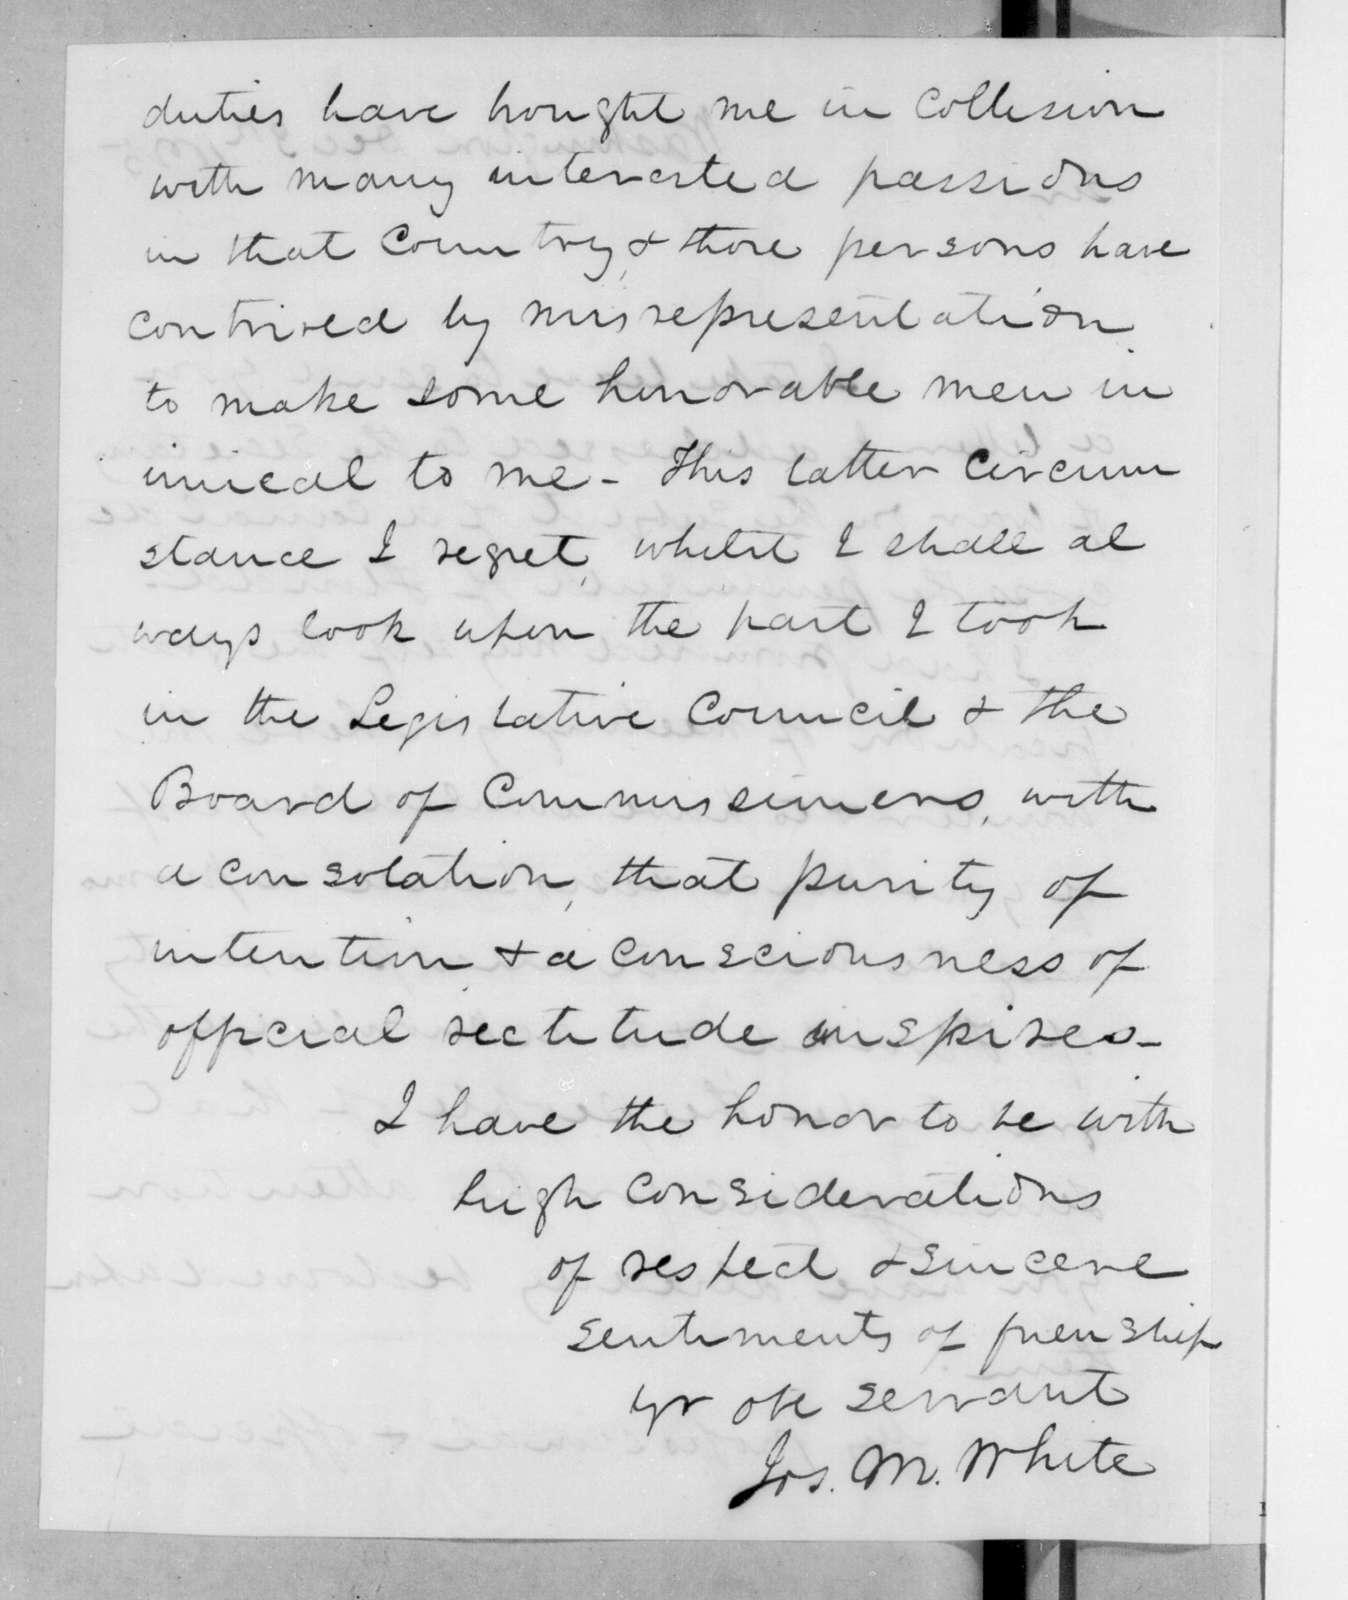 Joseph Maunsel White to Andrew Jackson, December 3, 1825